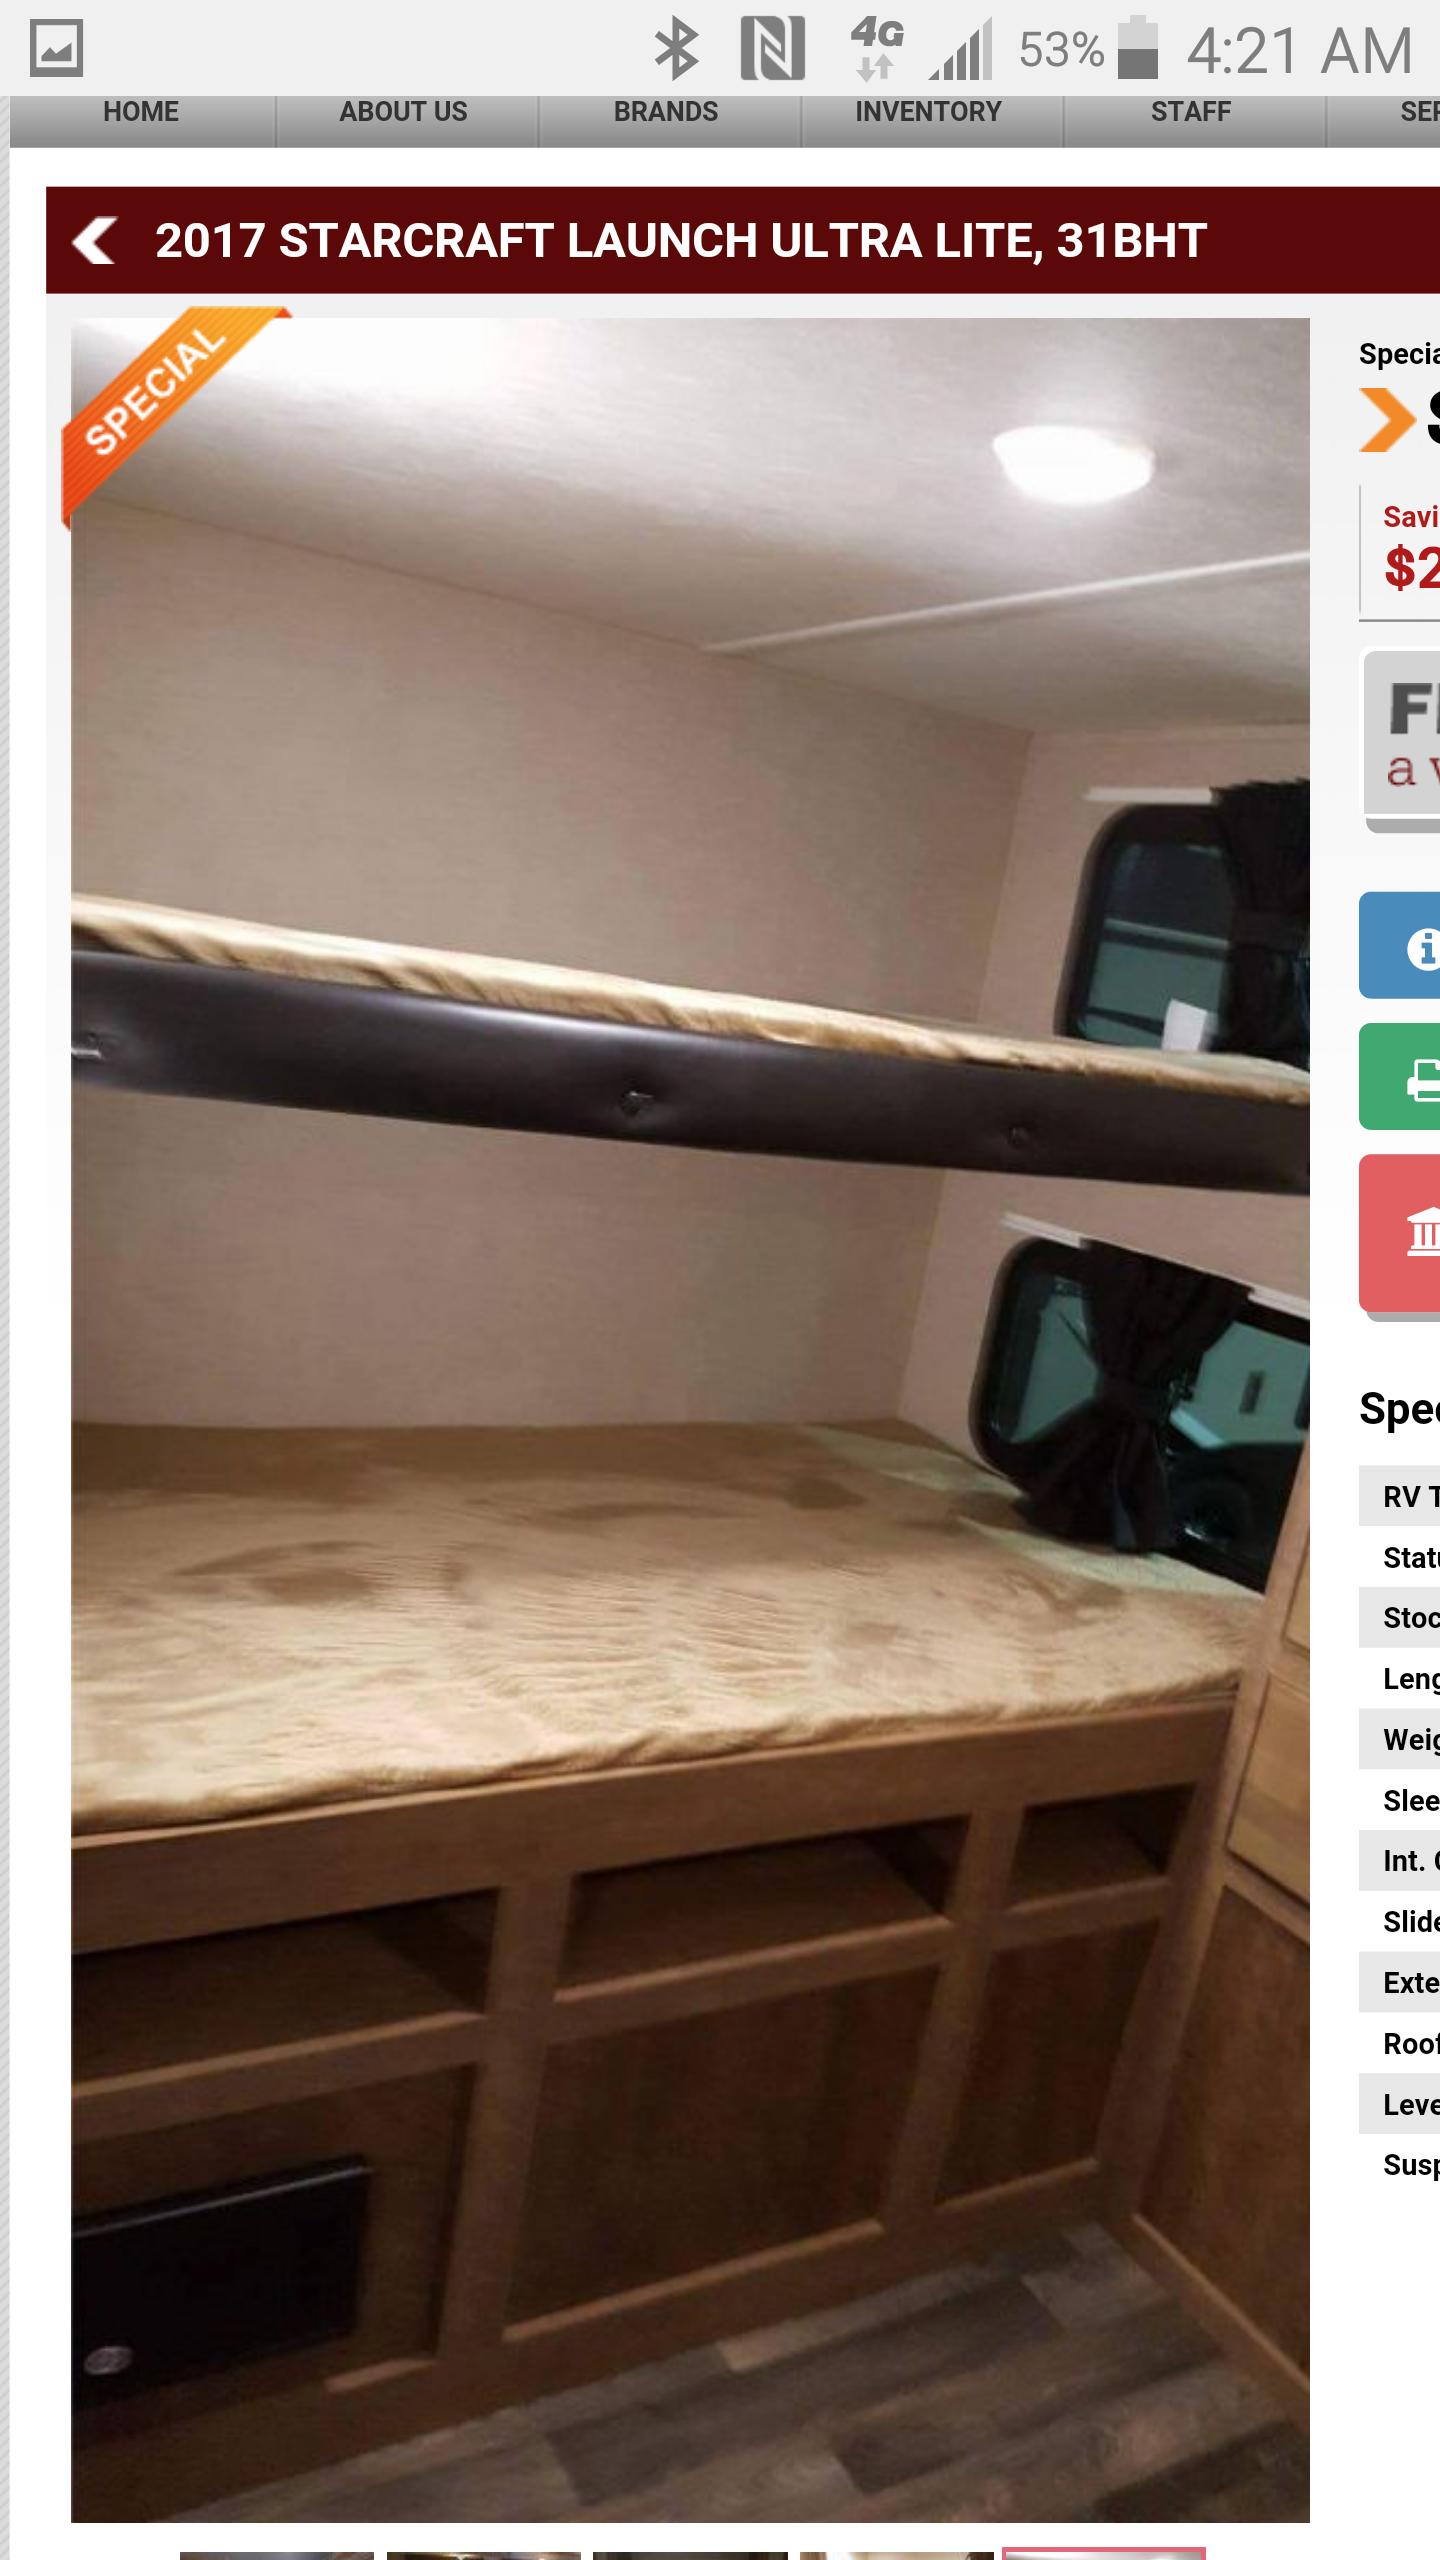 Kids Room - Bunk Beds. Starcraft Launch 2017